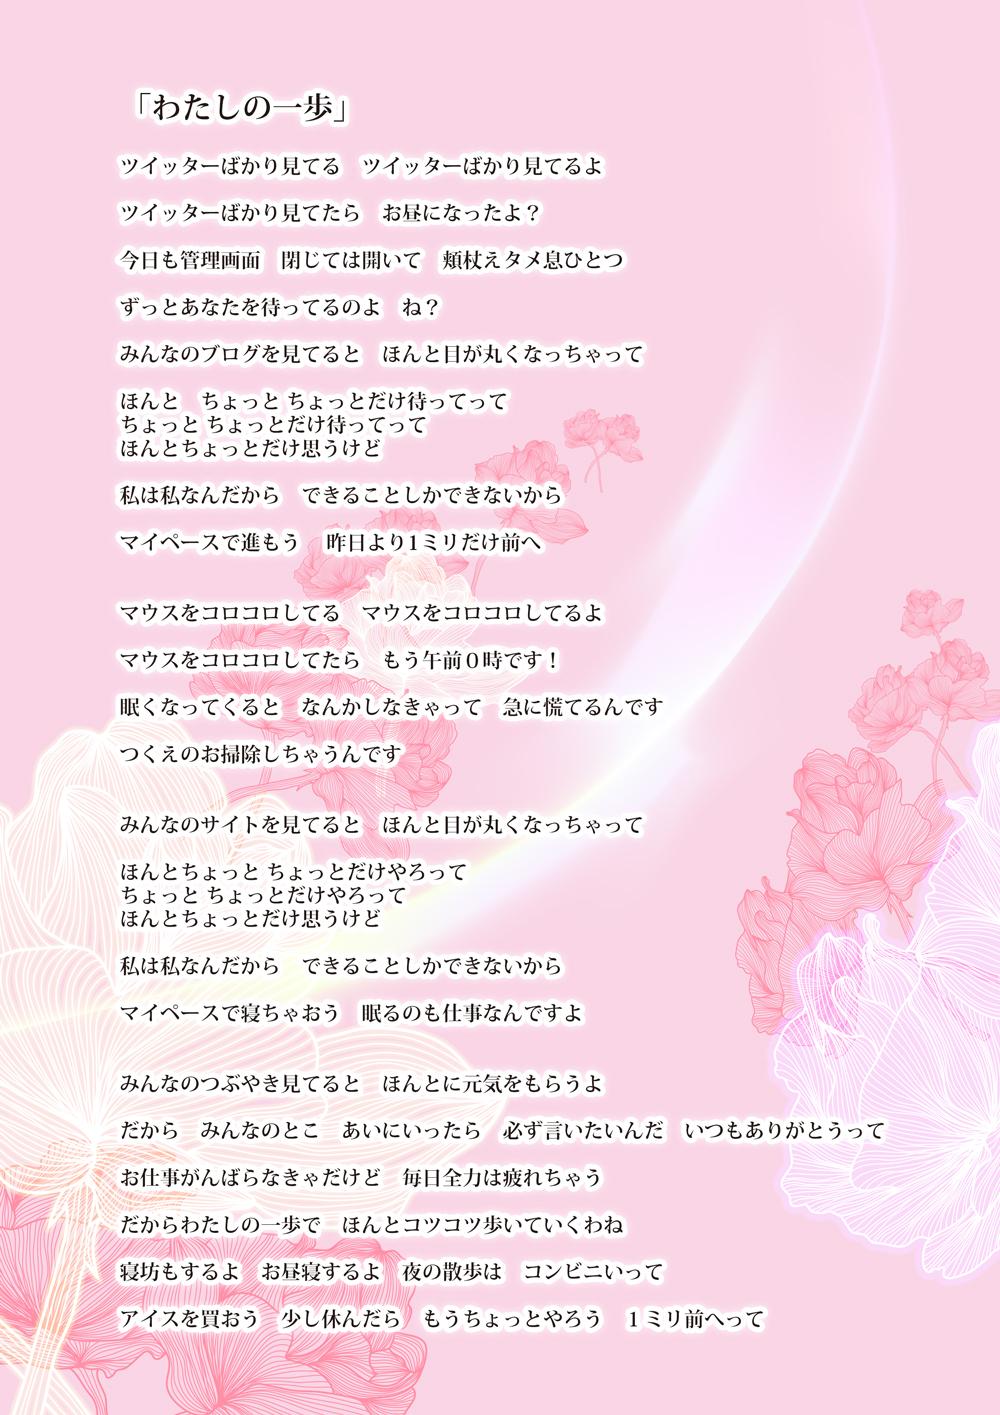 http://af0001.xsrv.jp/watasinoippo.jpg